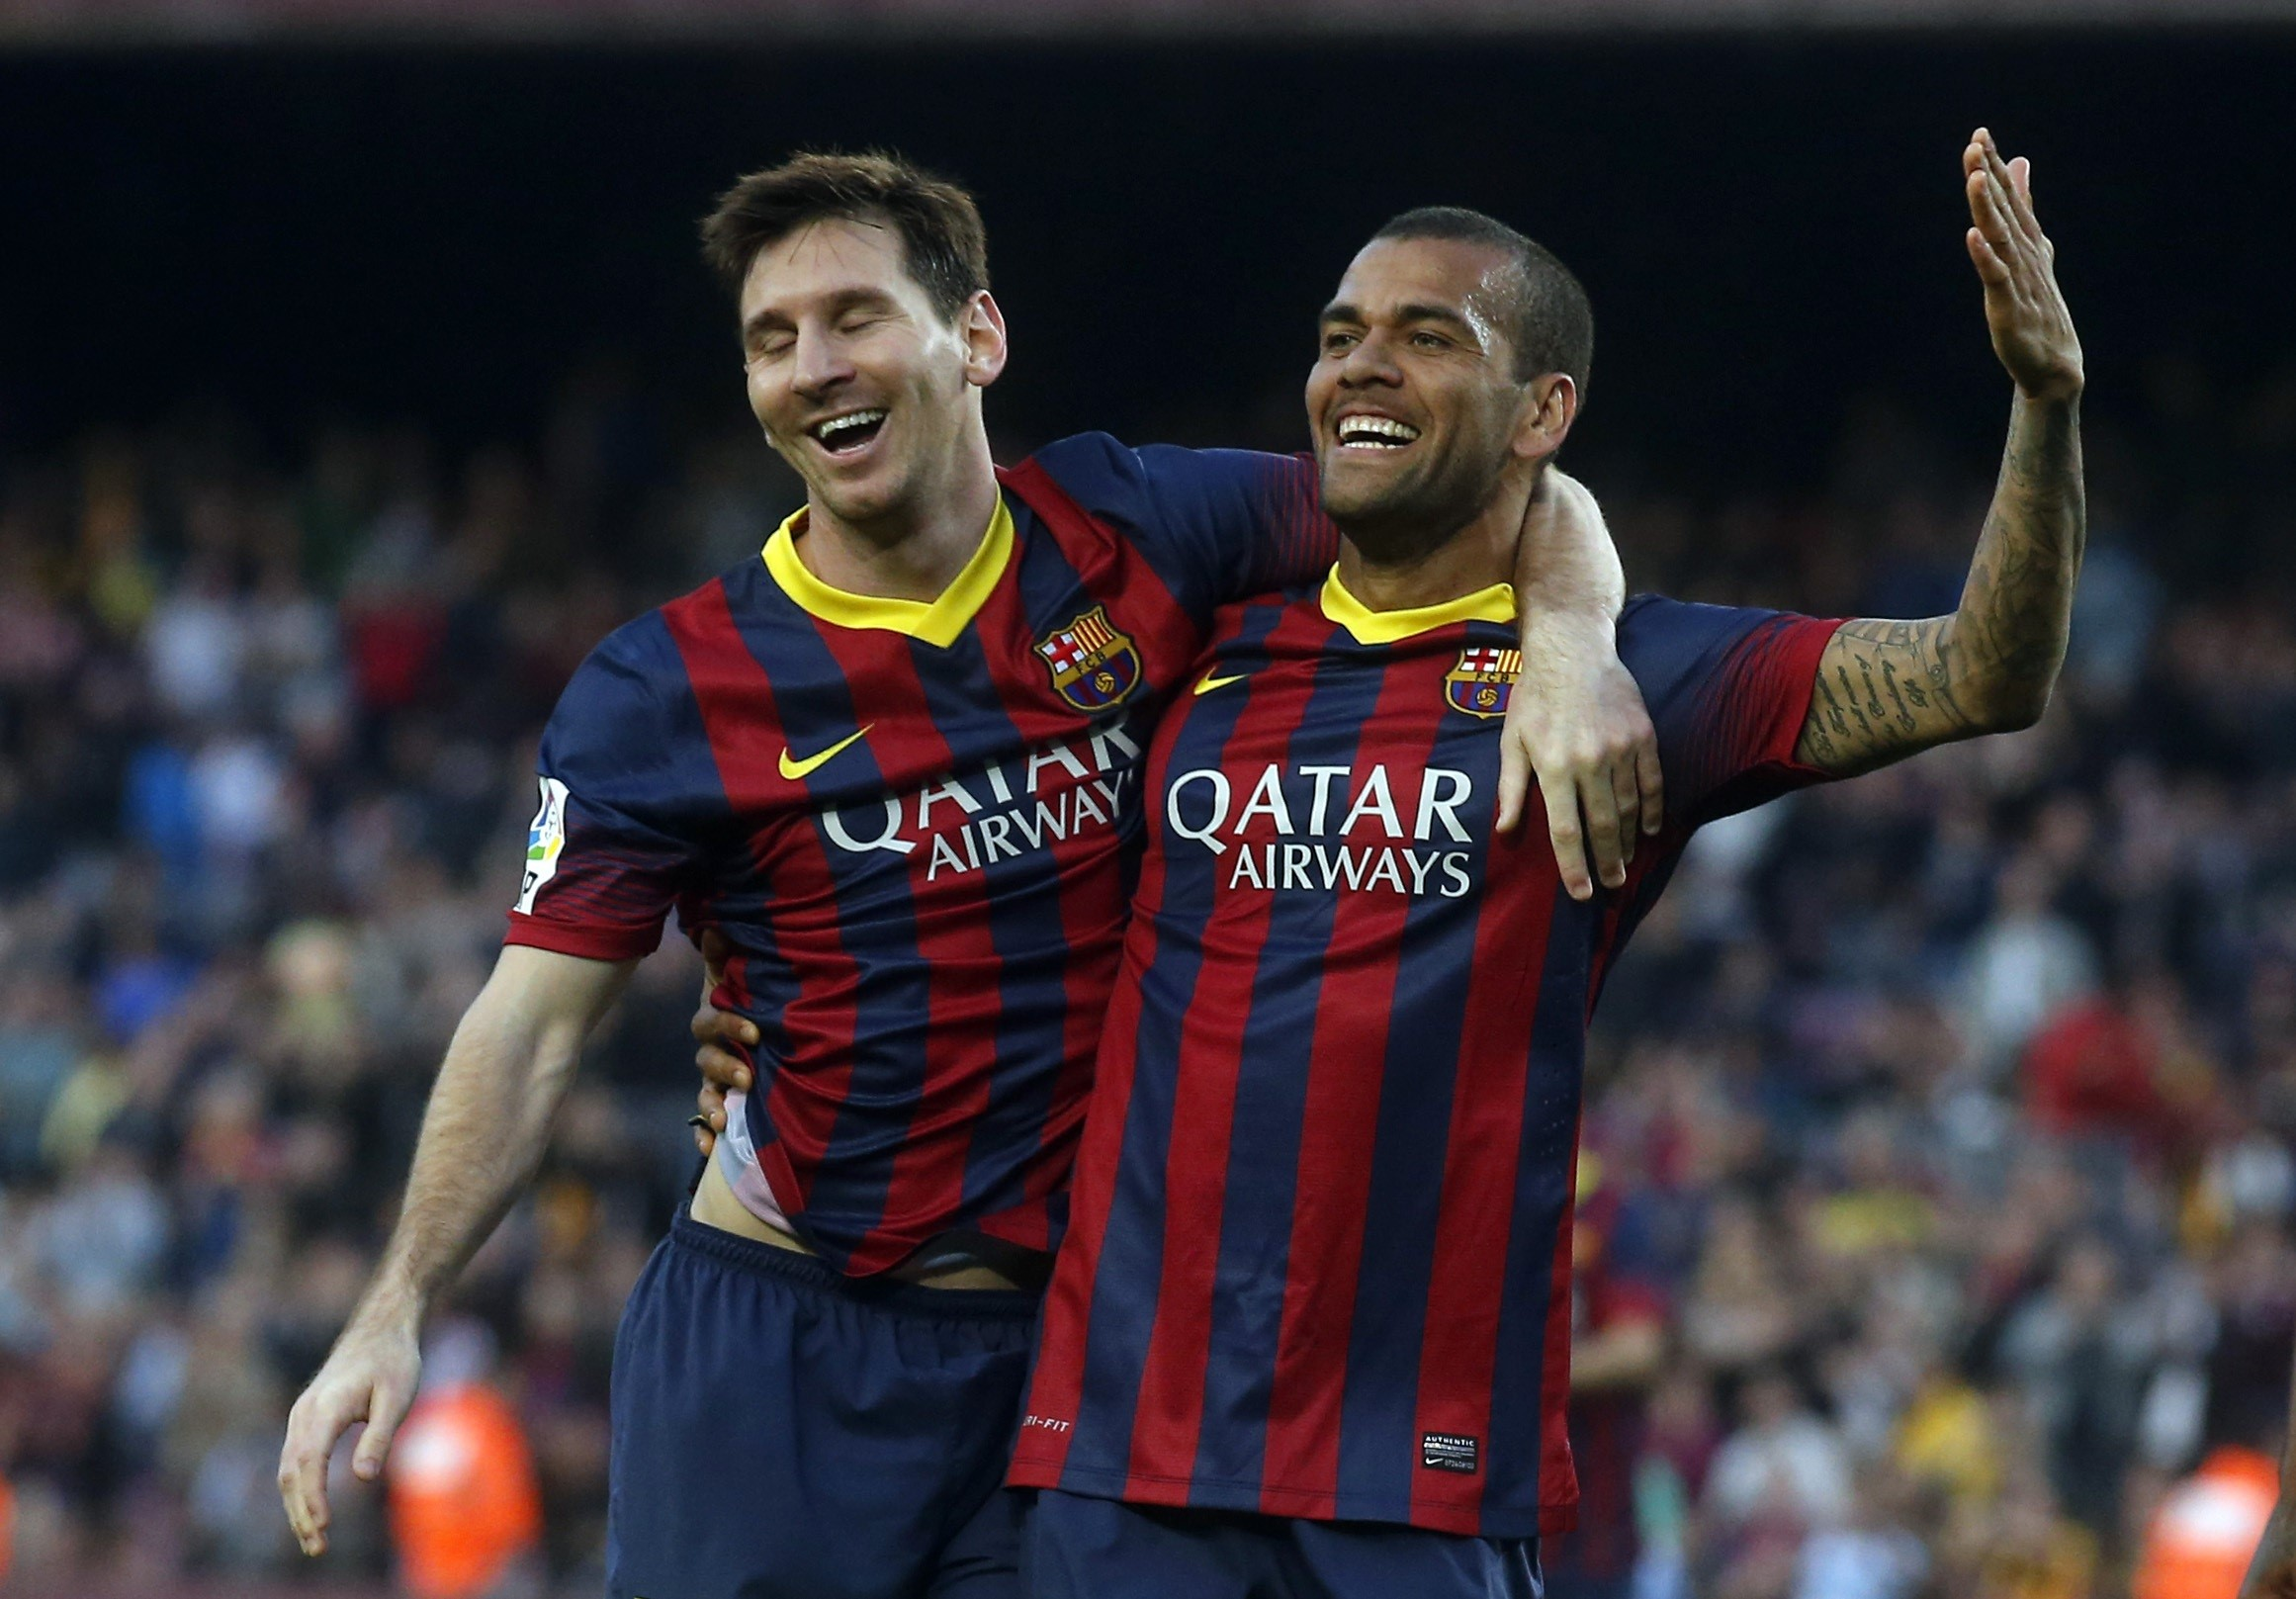 Dani Alves & Messi